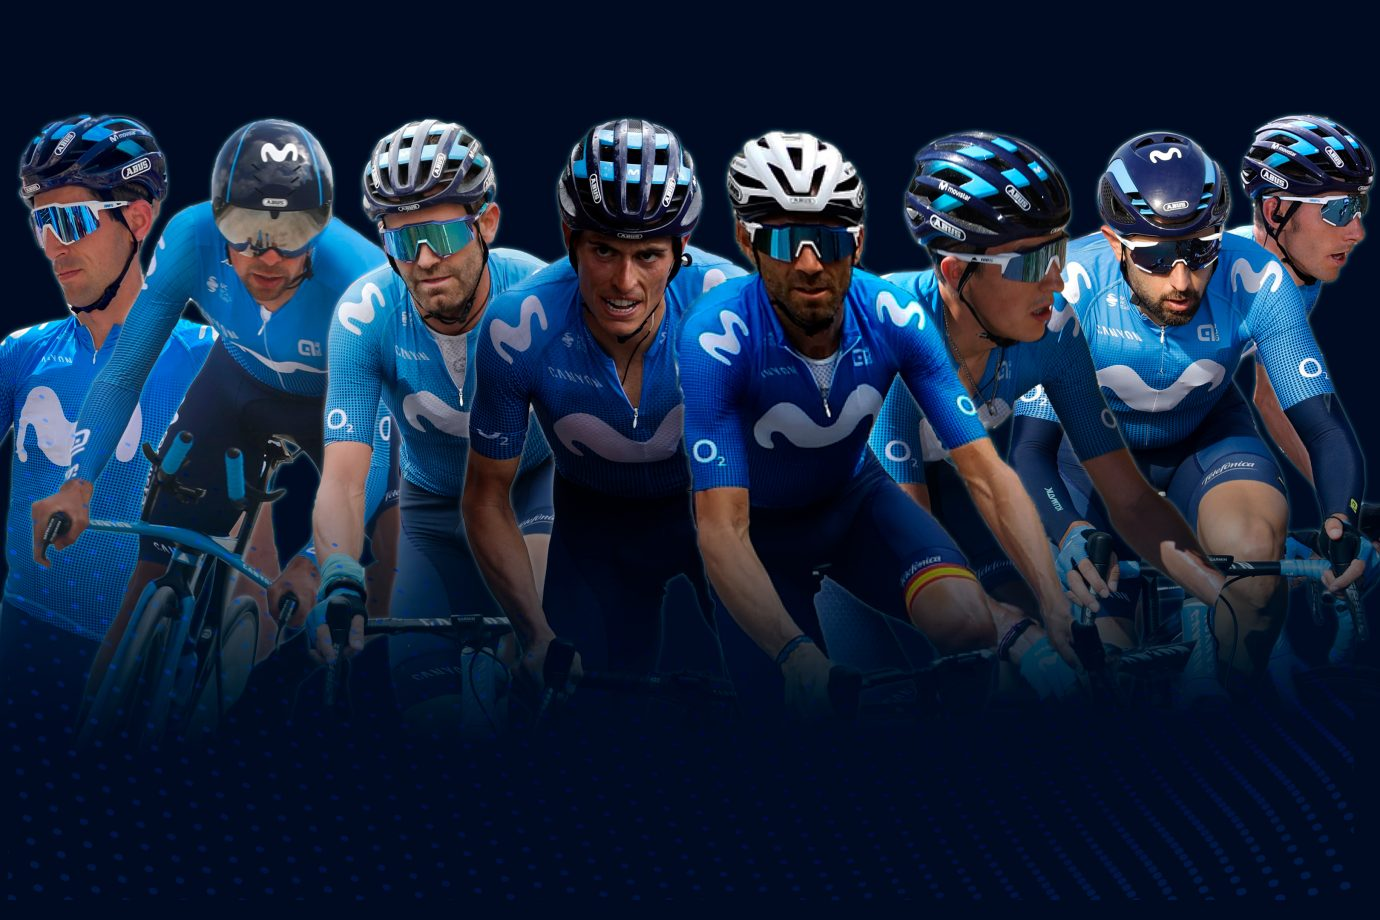 Imagen de la noticia 'Movistar Team confirms 2020 Tour de France lineup'